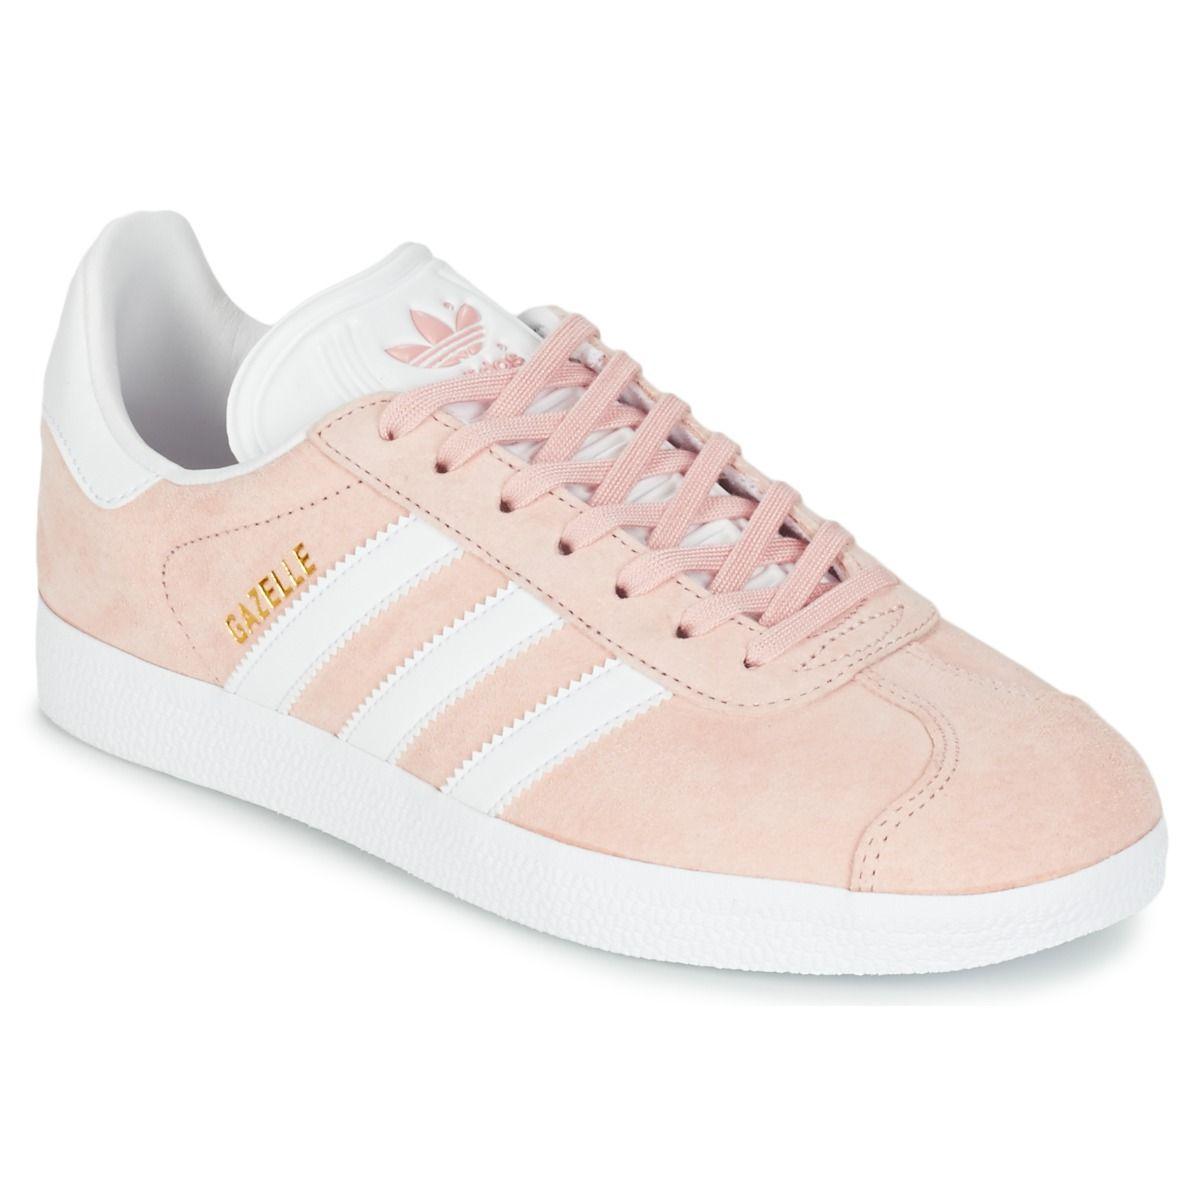 Gazelle | Adidas, Addidas sneakers, Adidas shoes